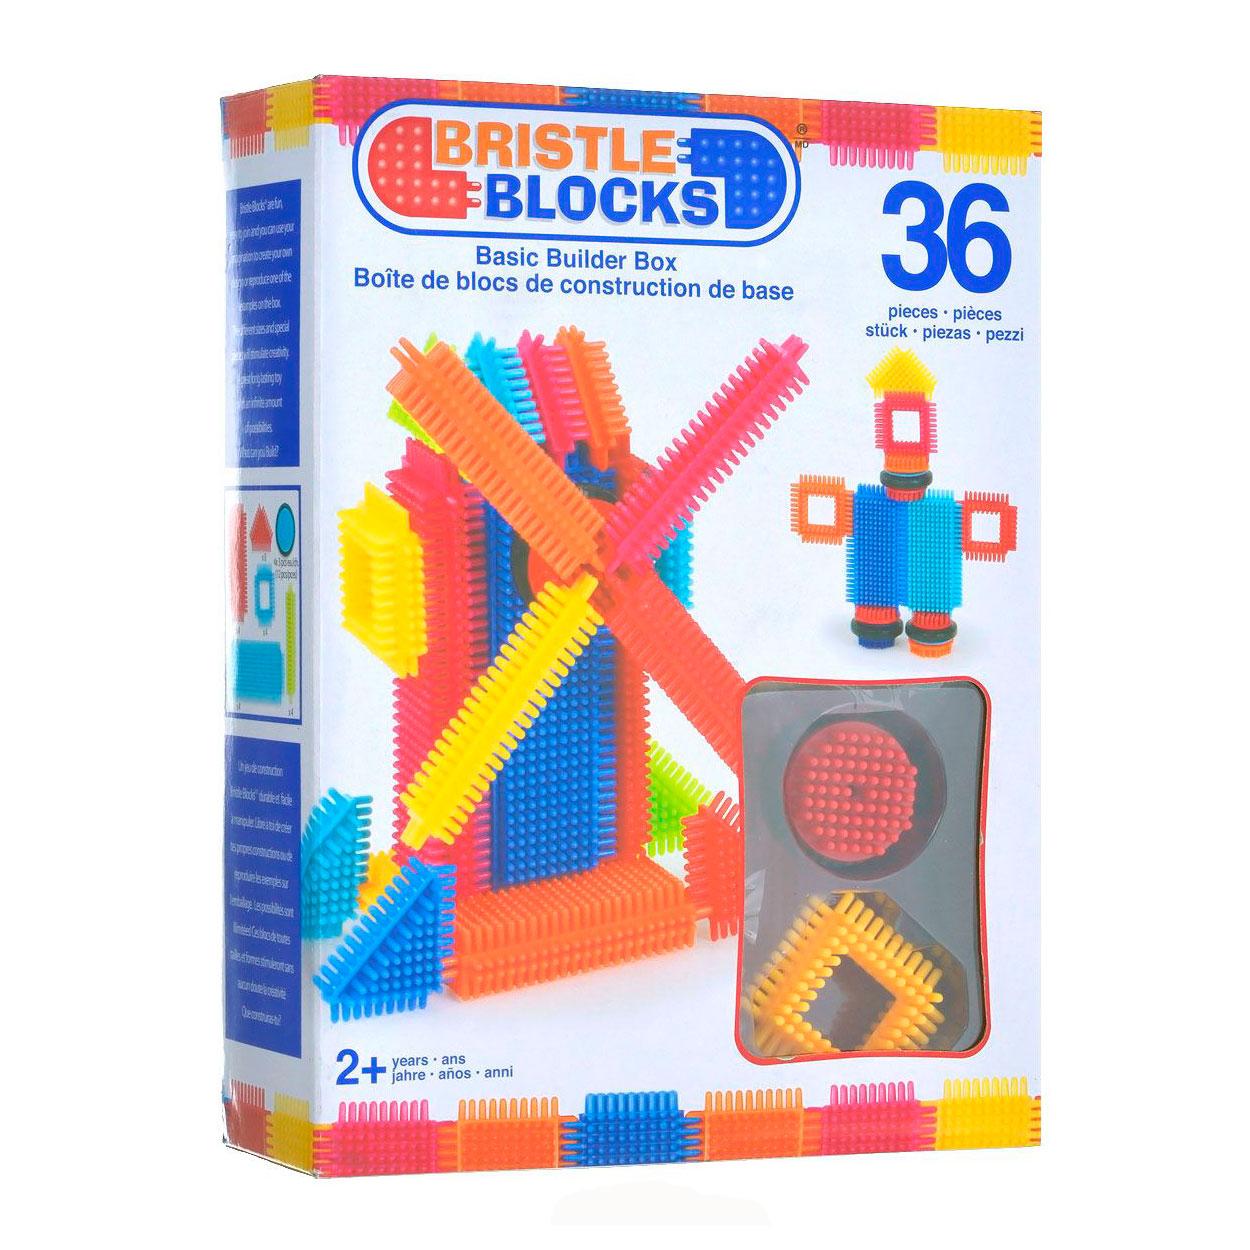 Конструктор Bristle Blocks 36 деталей в коробке<br>